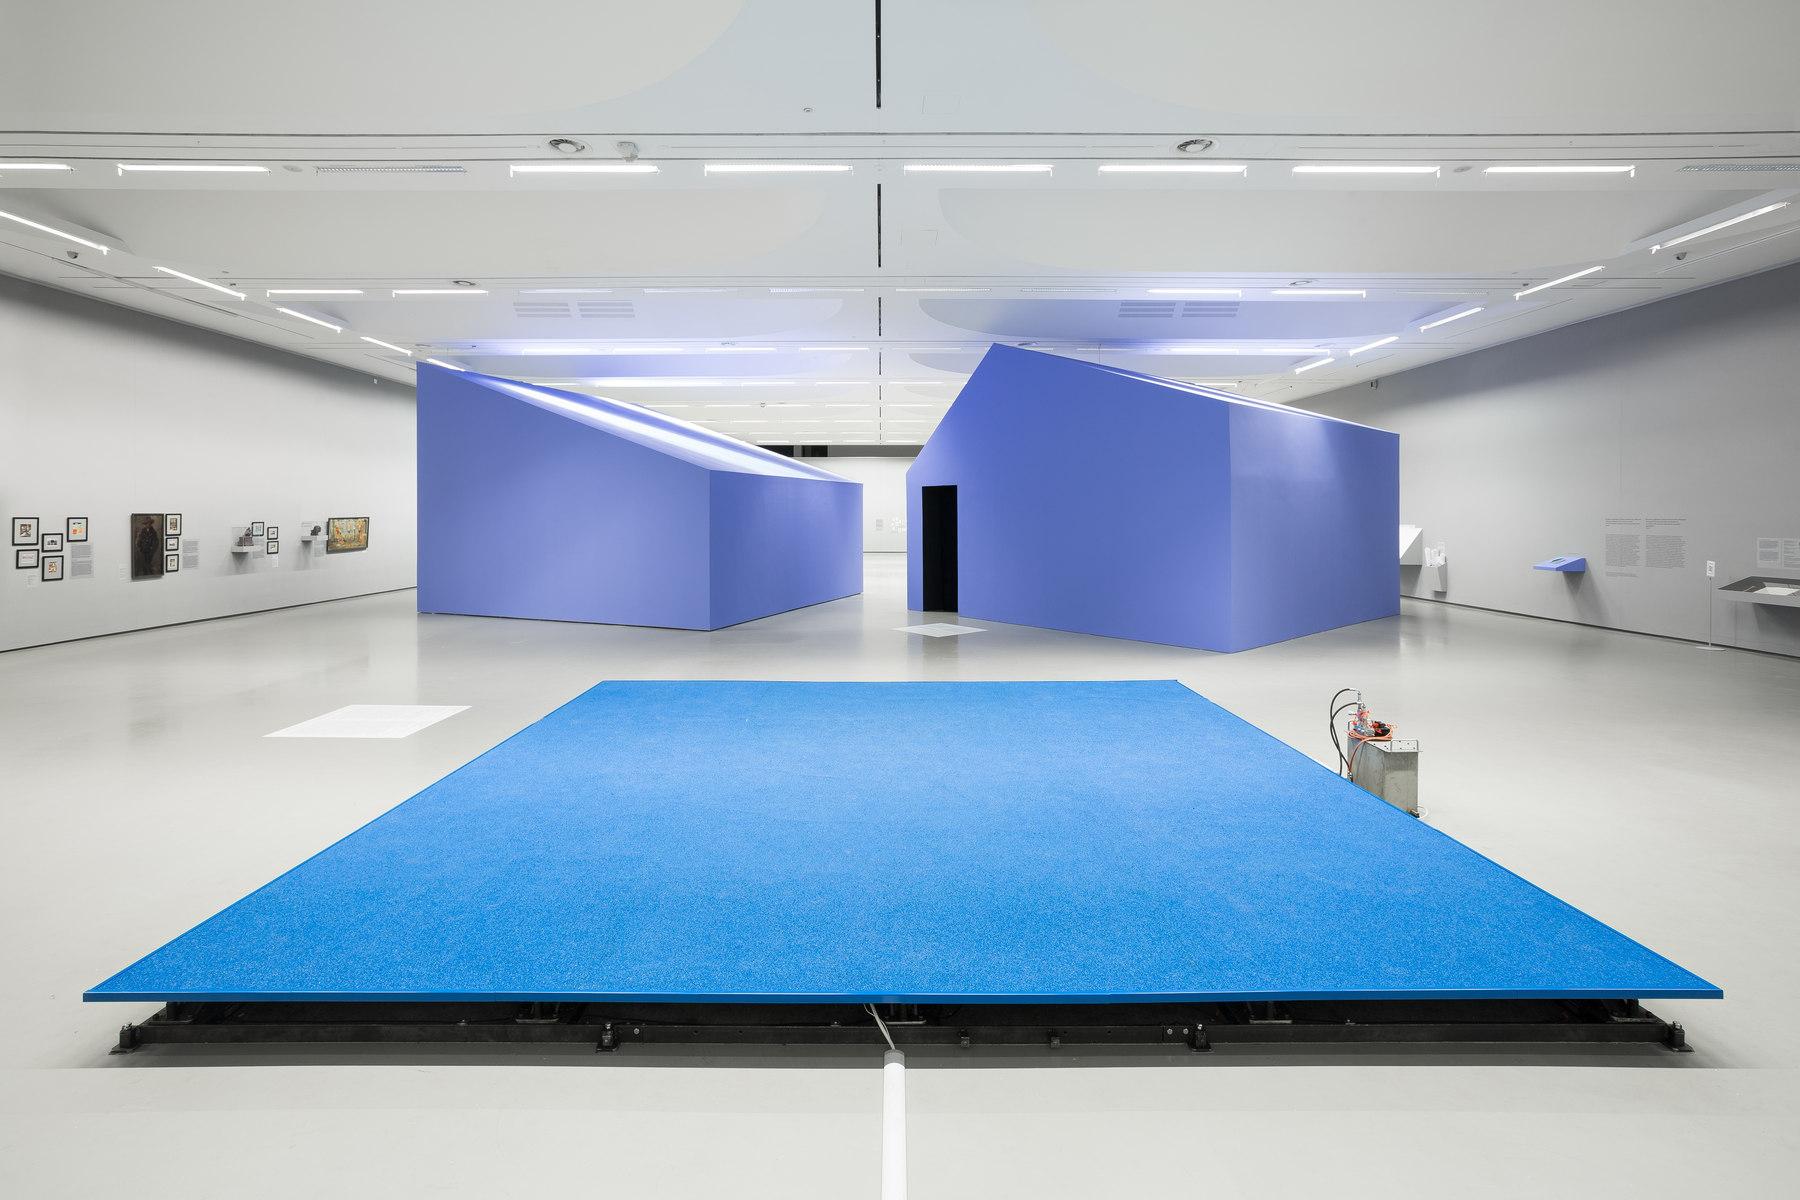 29-Citynature-Vilnius and Beyond-National-Gallery-Of-Art-Vilnius-2017-Julijonas-Urbonas